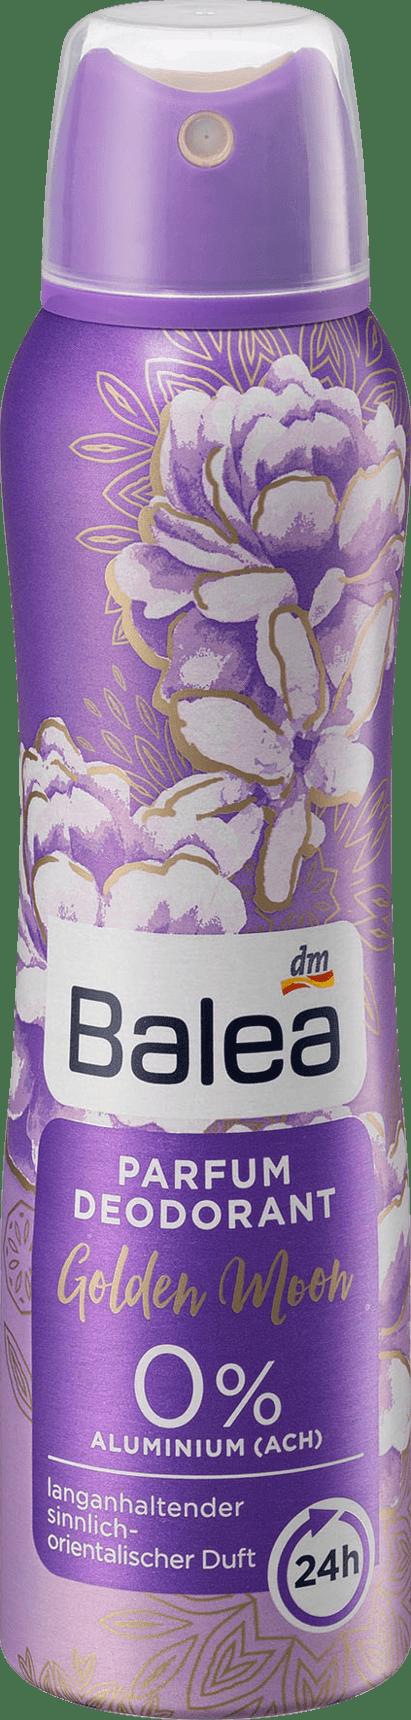 Balea Déodorant Parfum Golden Moon